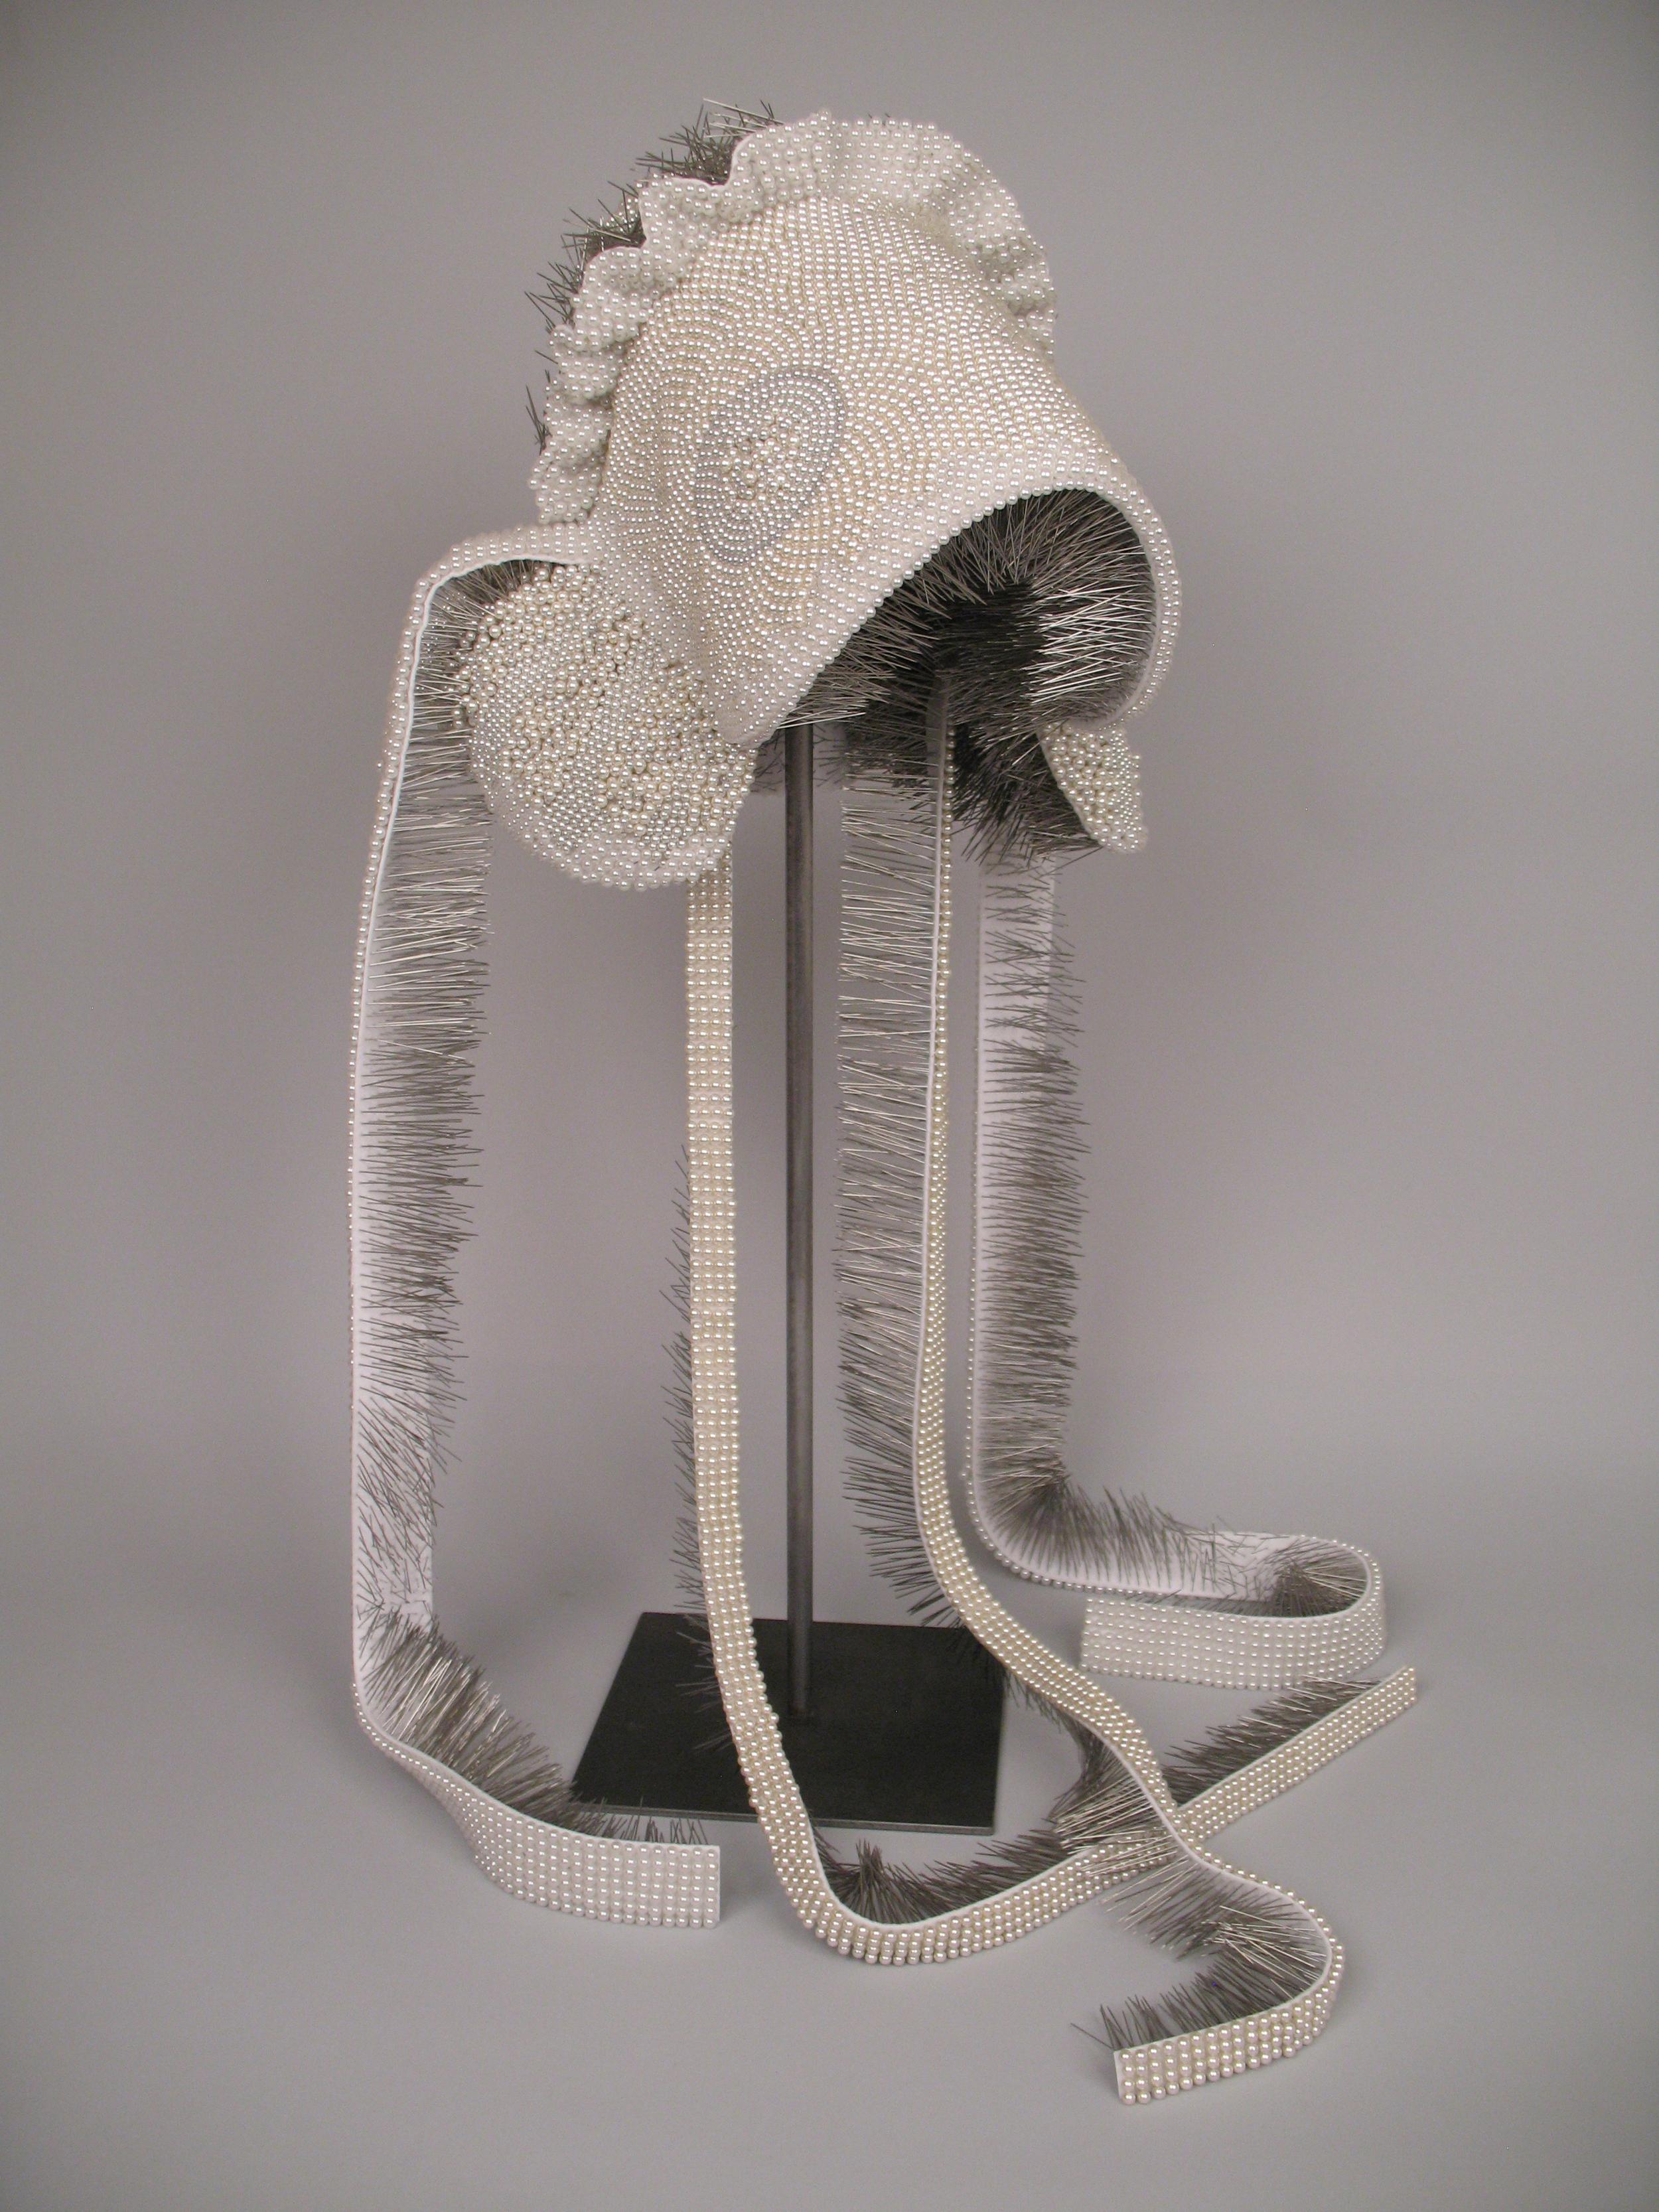 "Seer Bonnet X  17,214 pearl corsage pins, fabric, steel, 56"" x 12"" x 15"", 2010"